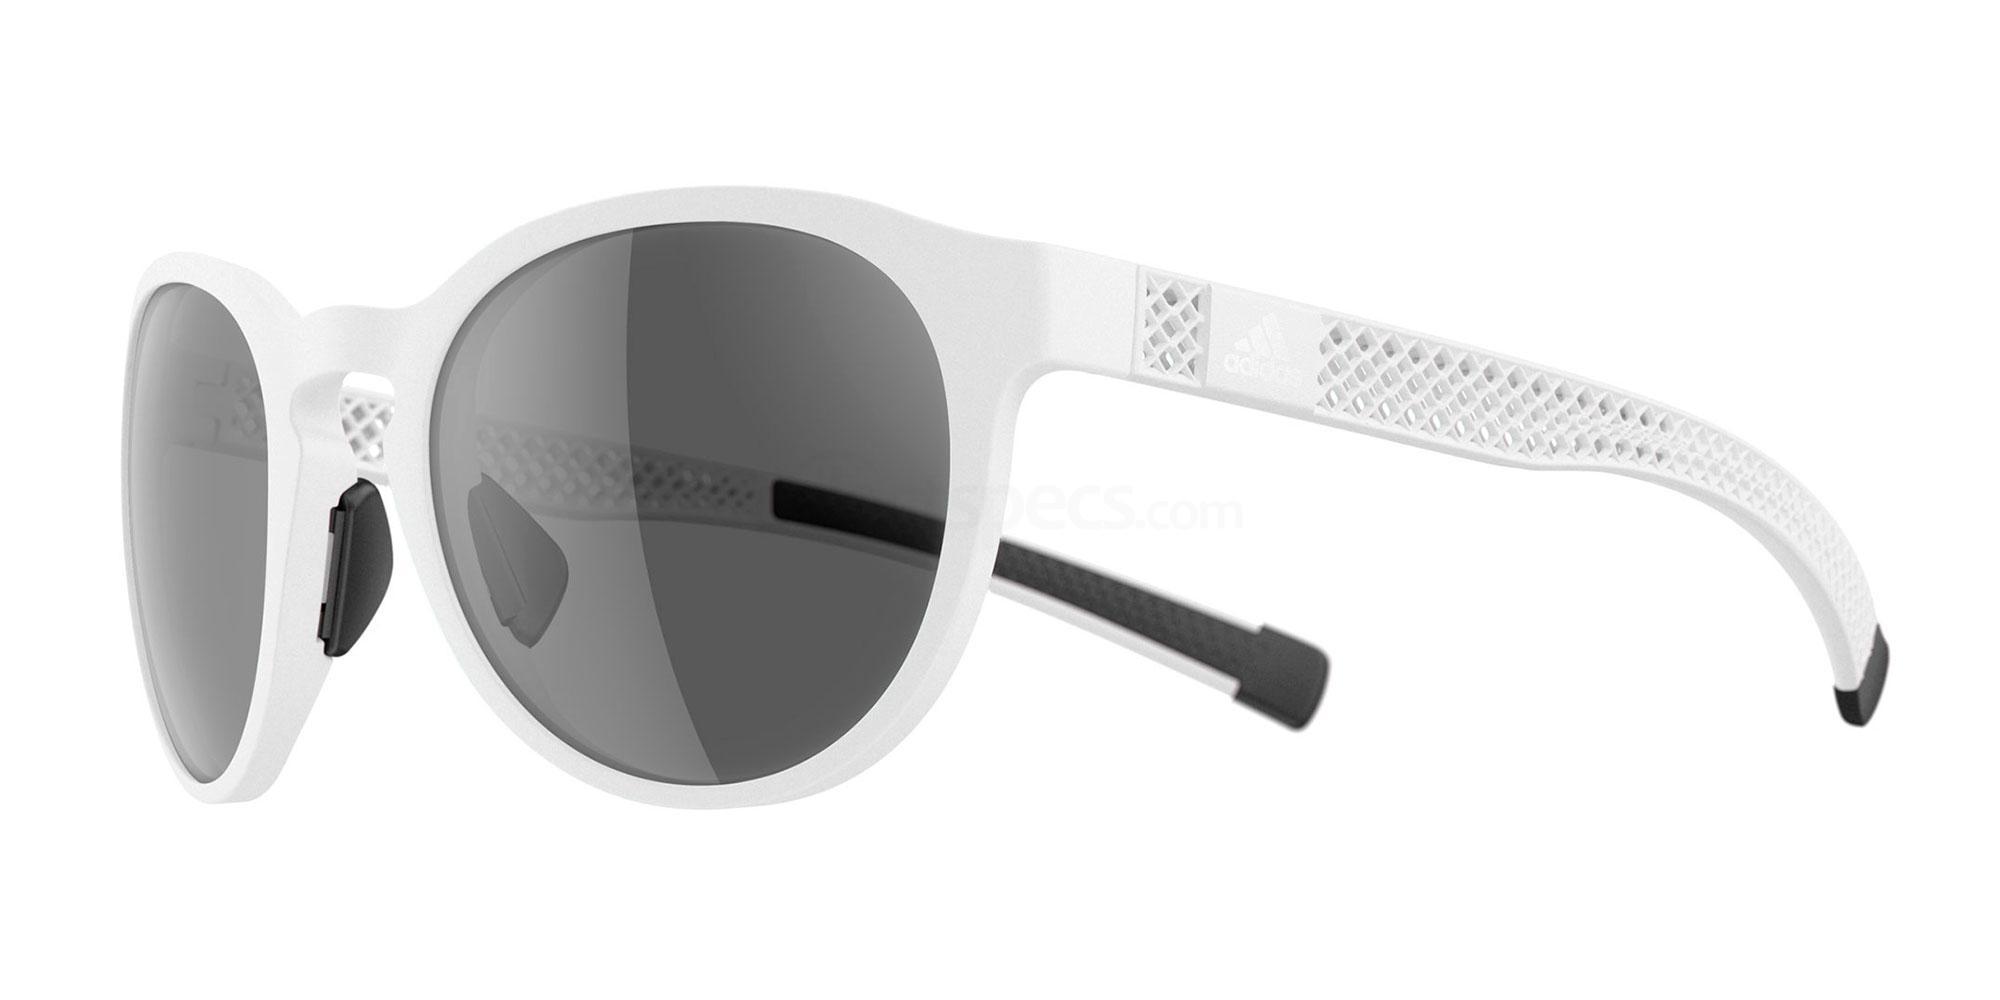 ad38 75 1500 ad38 Proshift 3D_X Sunglasses, Adidas